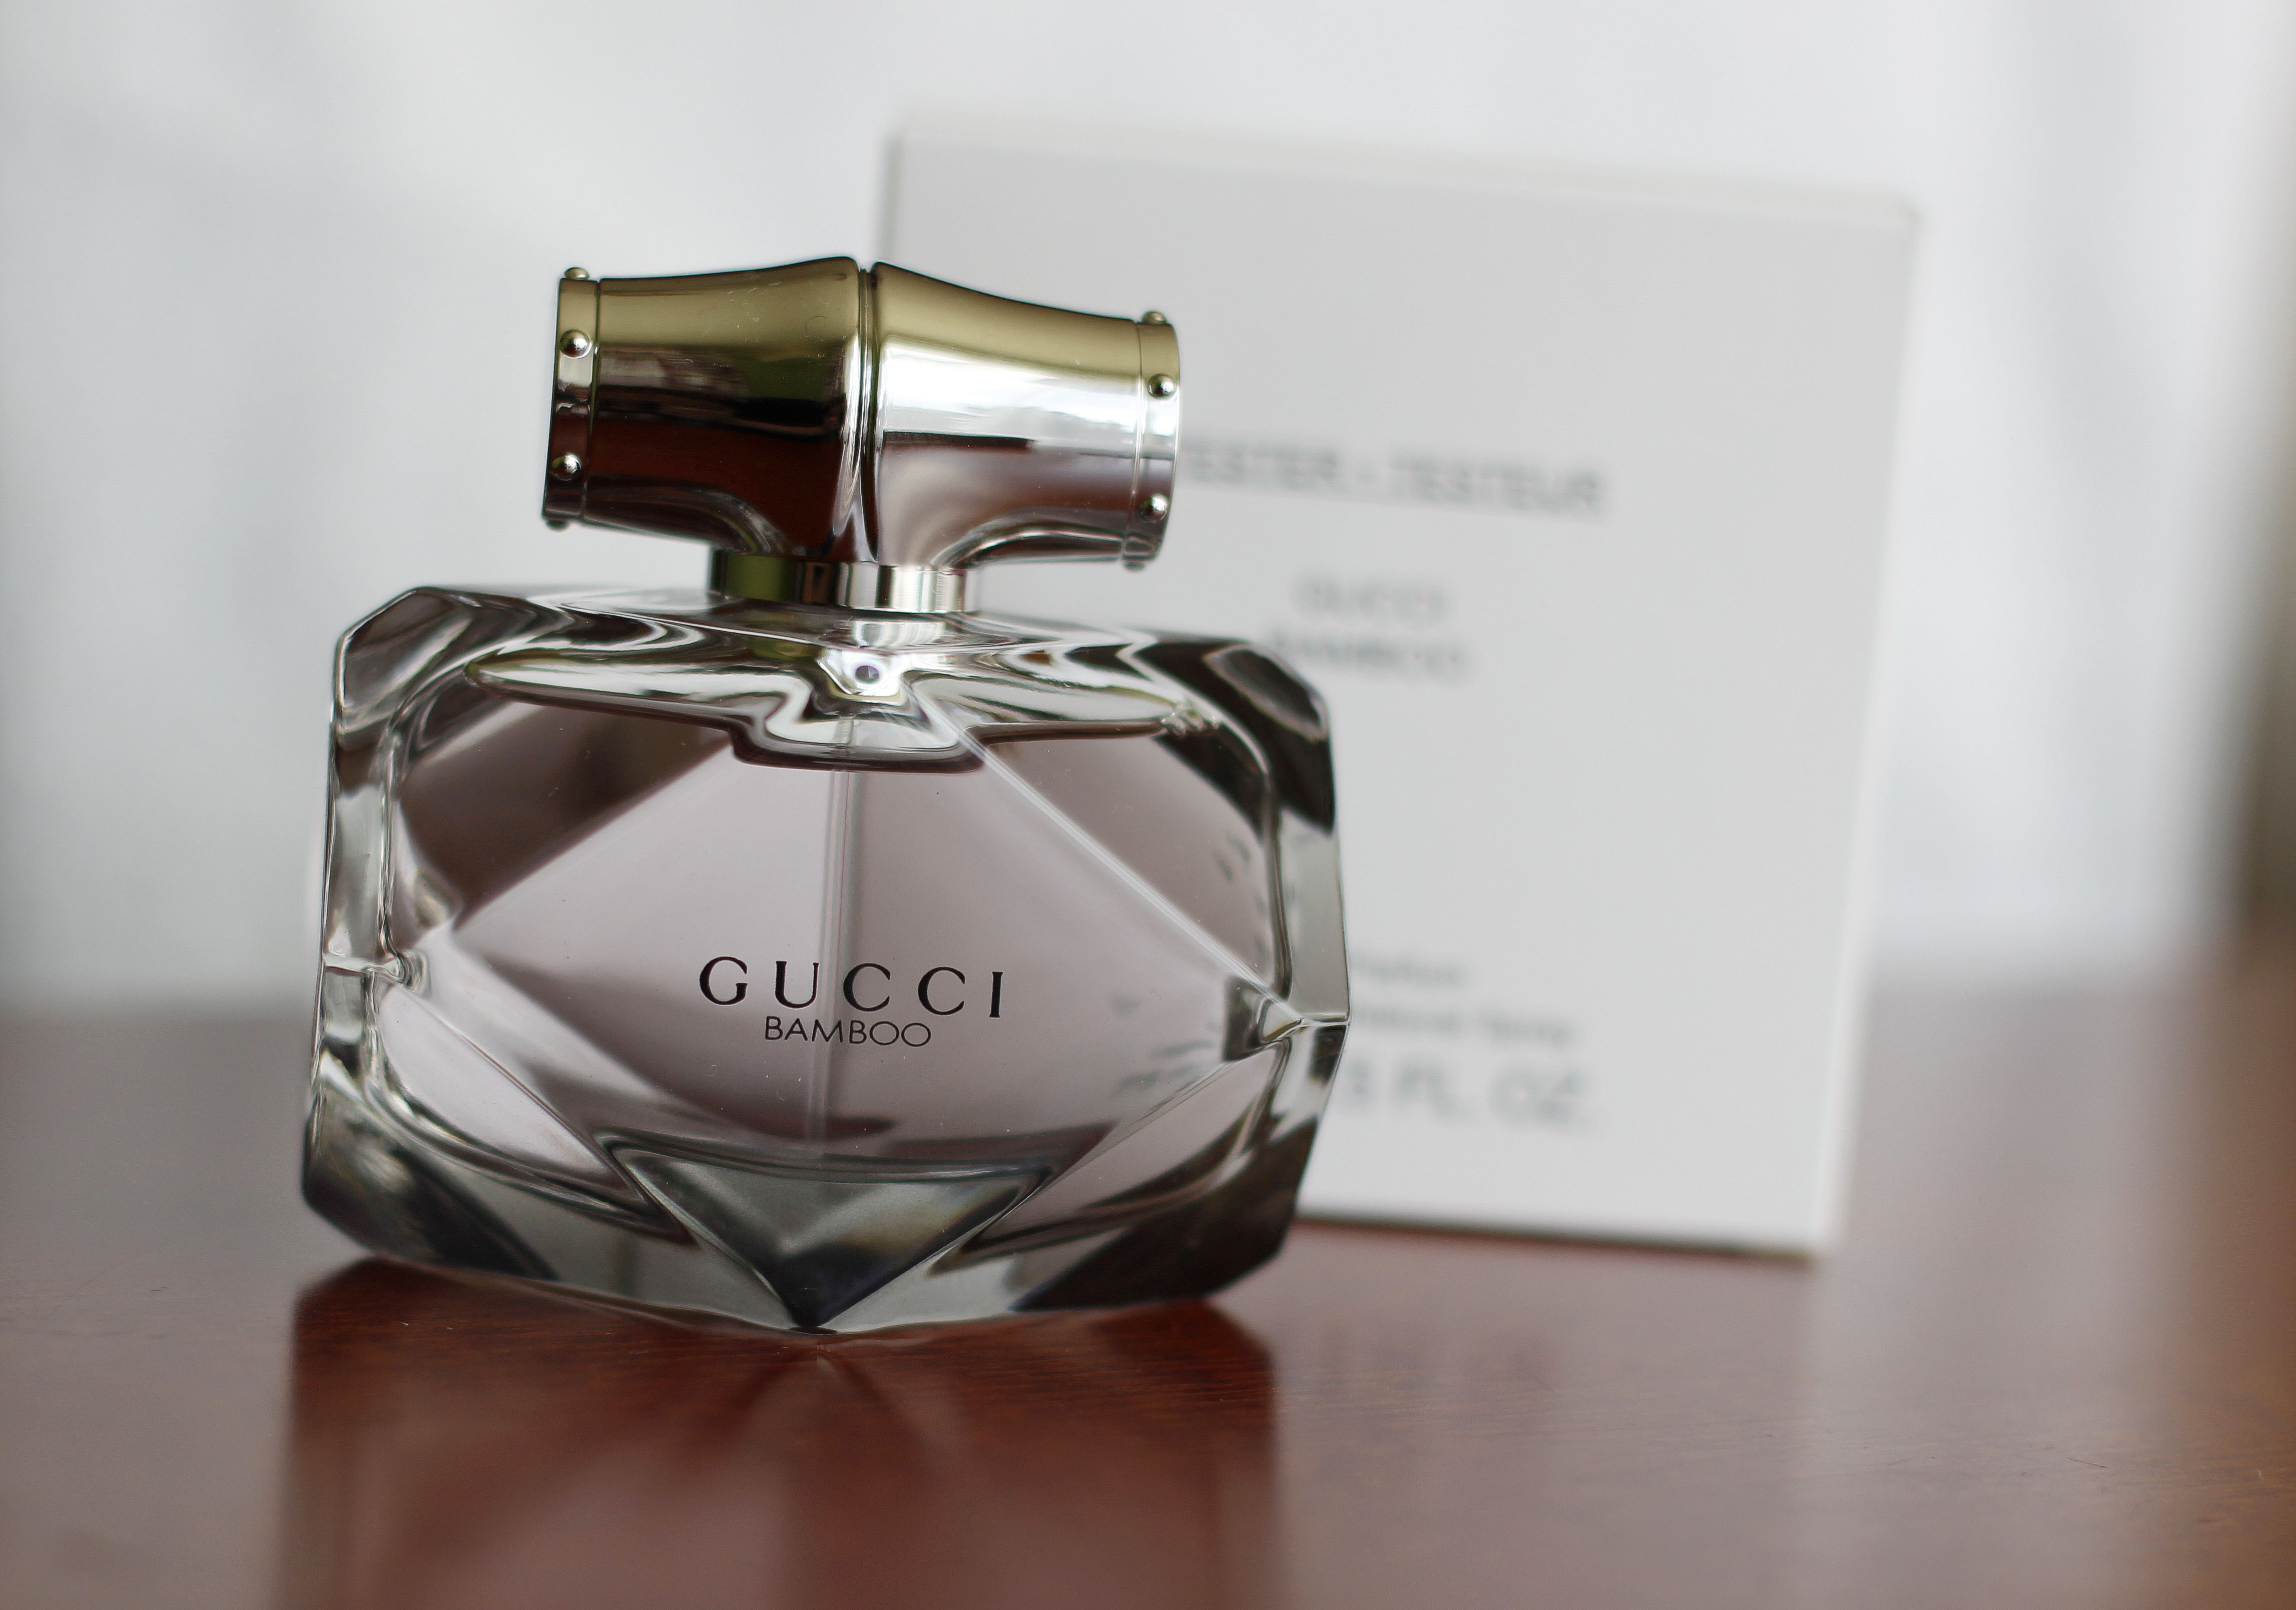 Prawdy i mity o testerach perfum